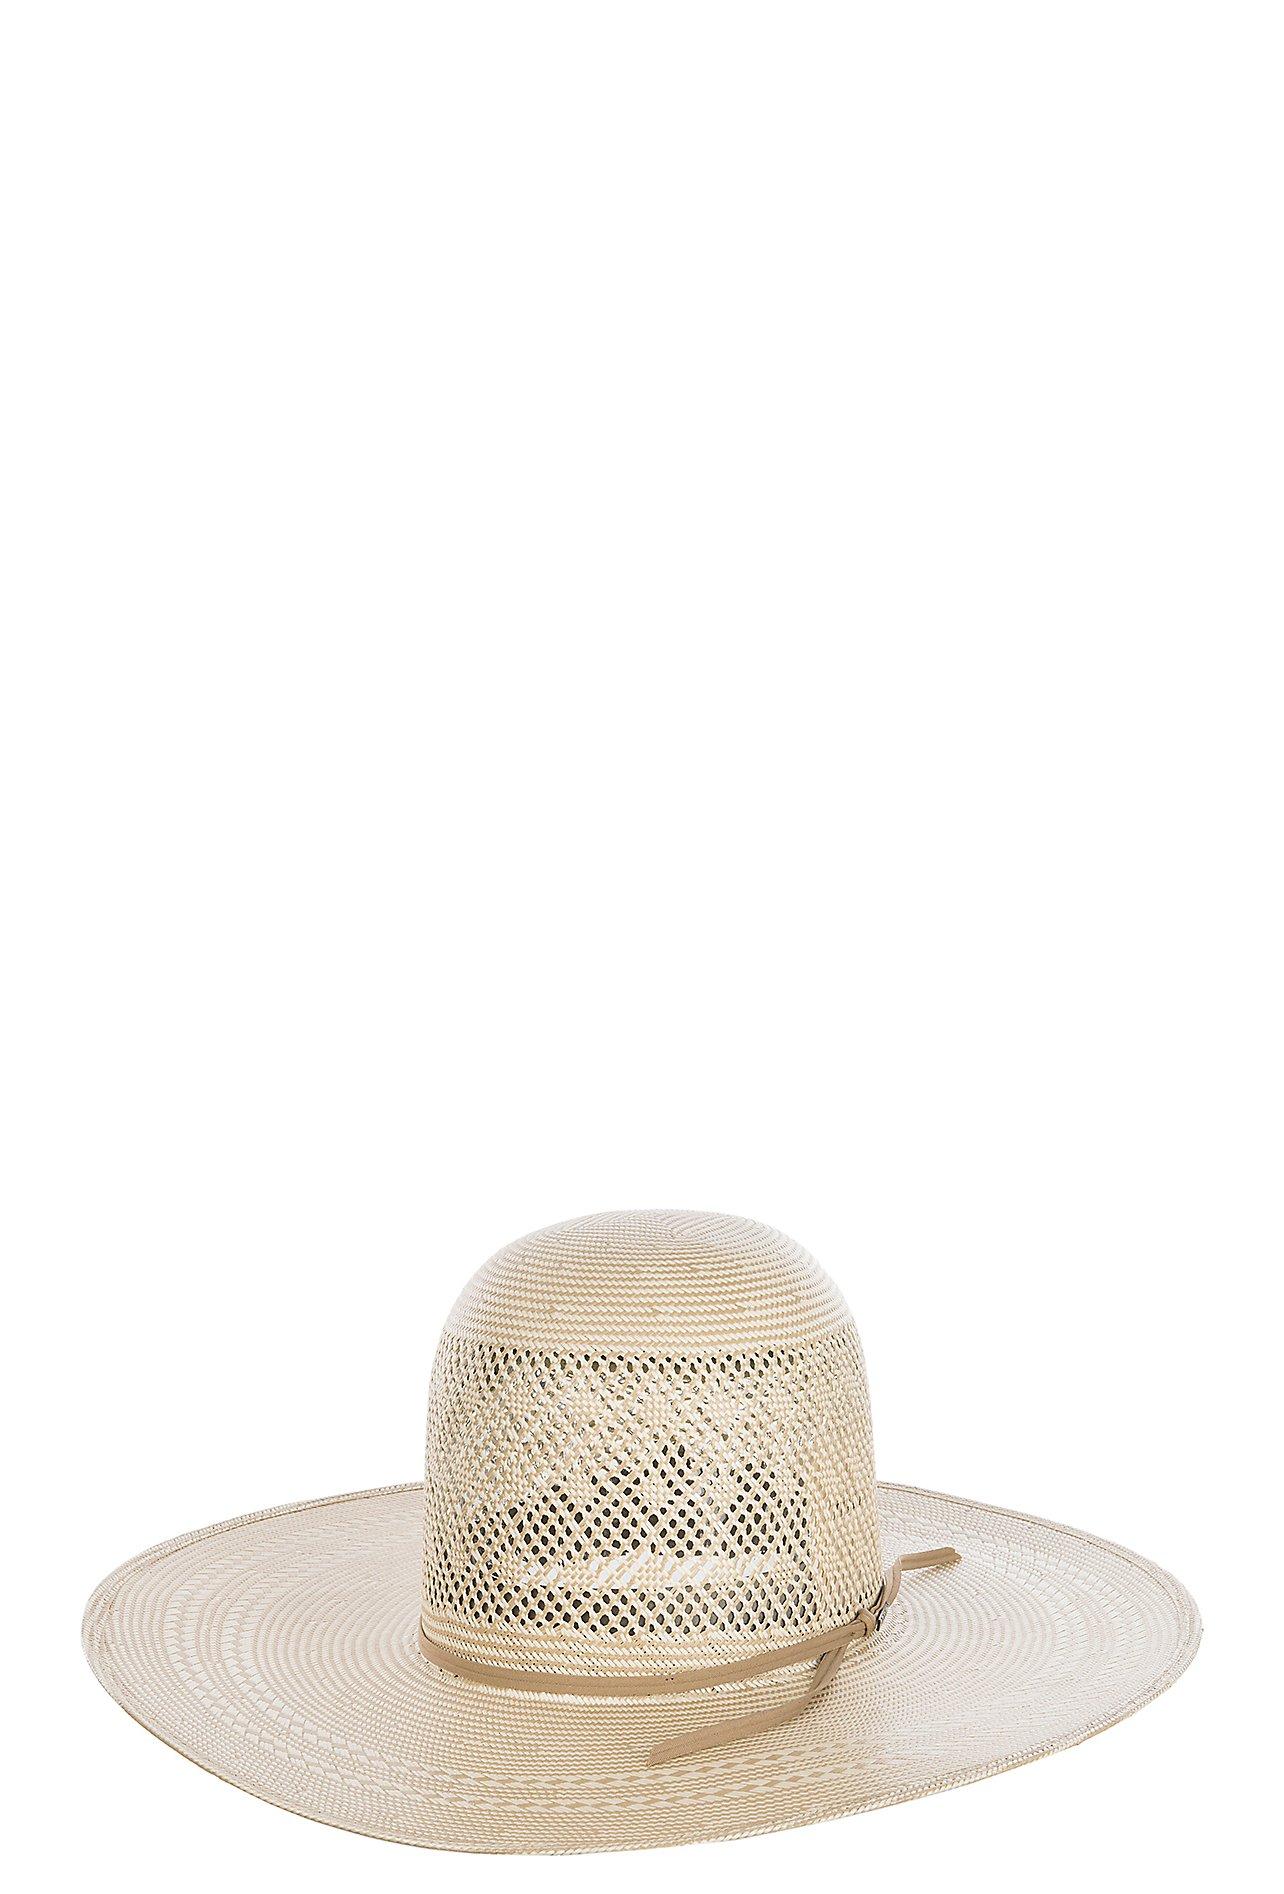 Resistol Men s 20X Clayton Vented Open Crown Straw Cowboy Hat ... 558b1b310de